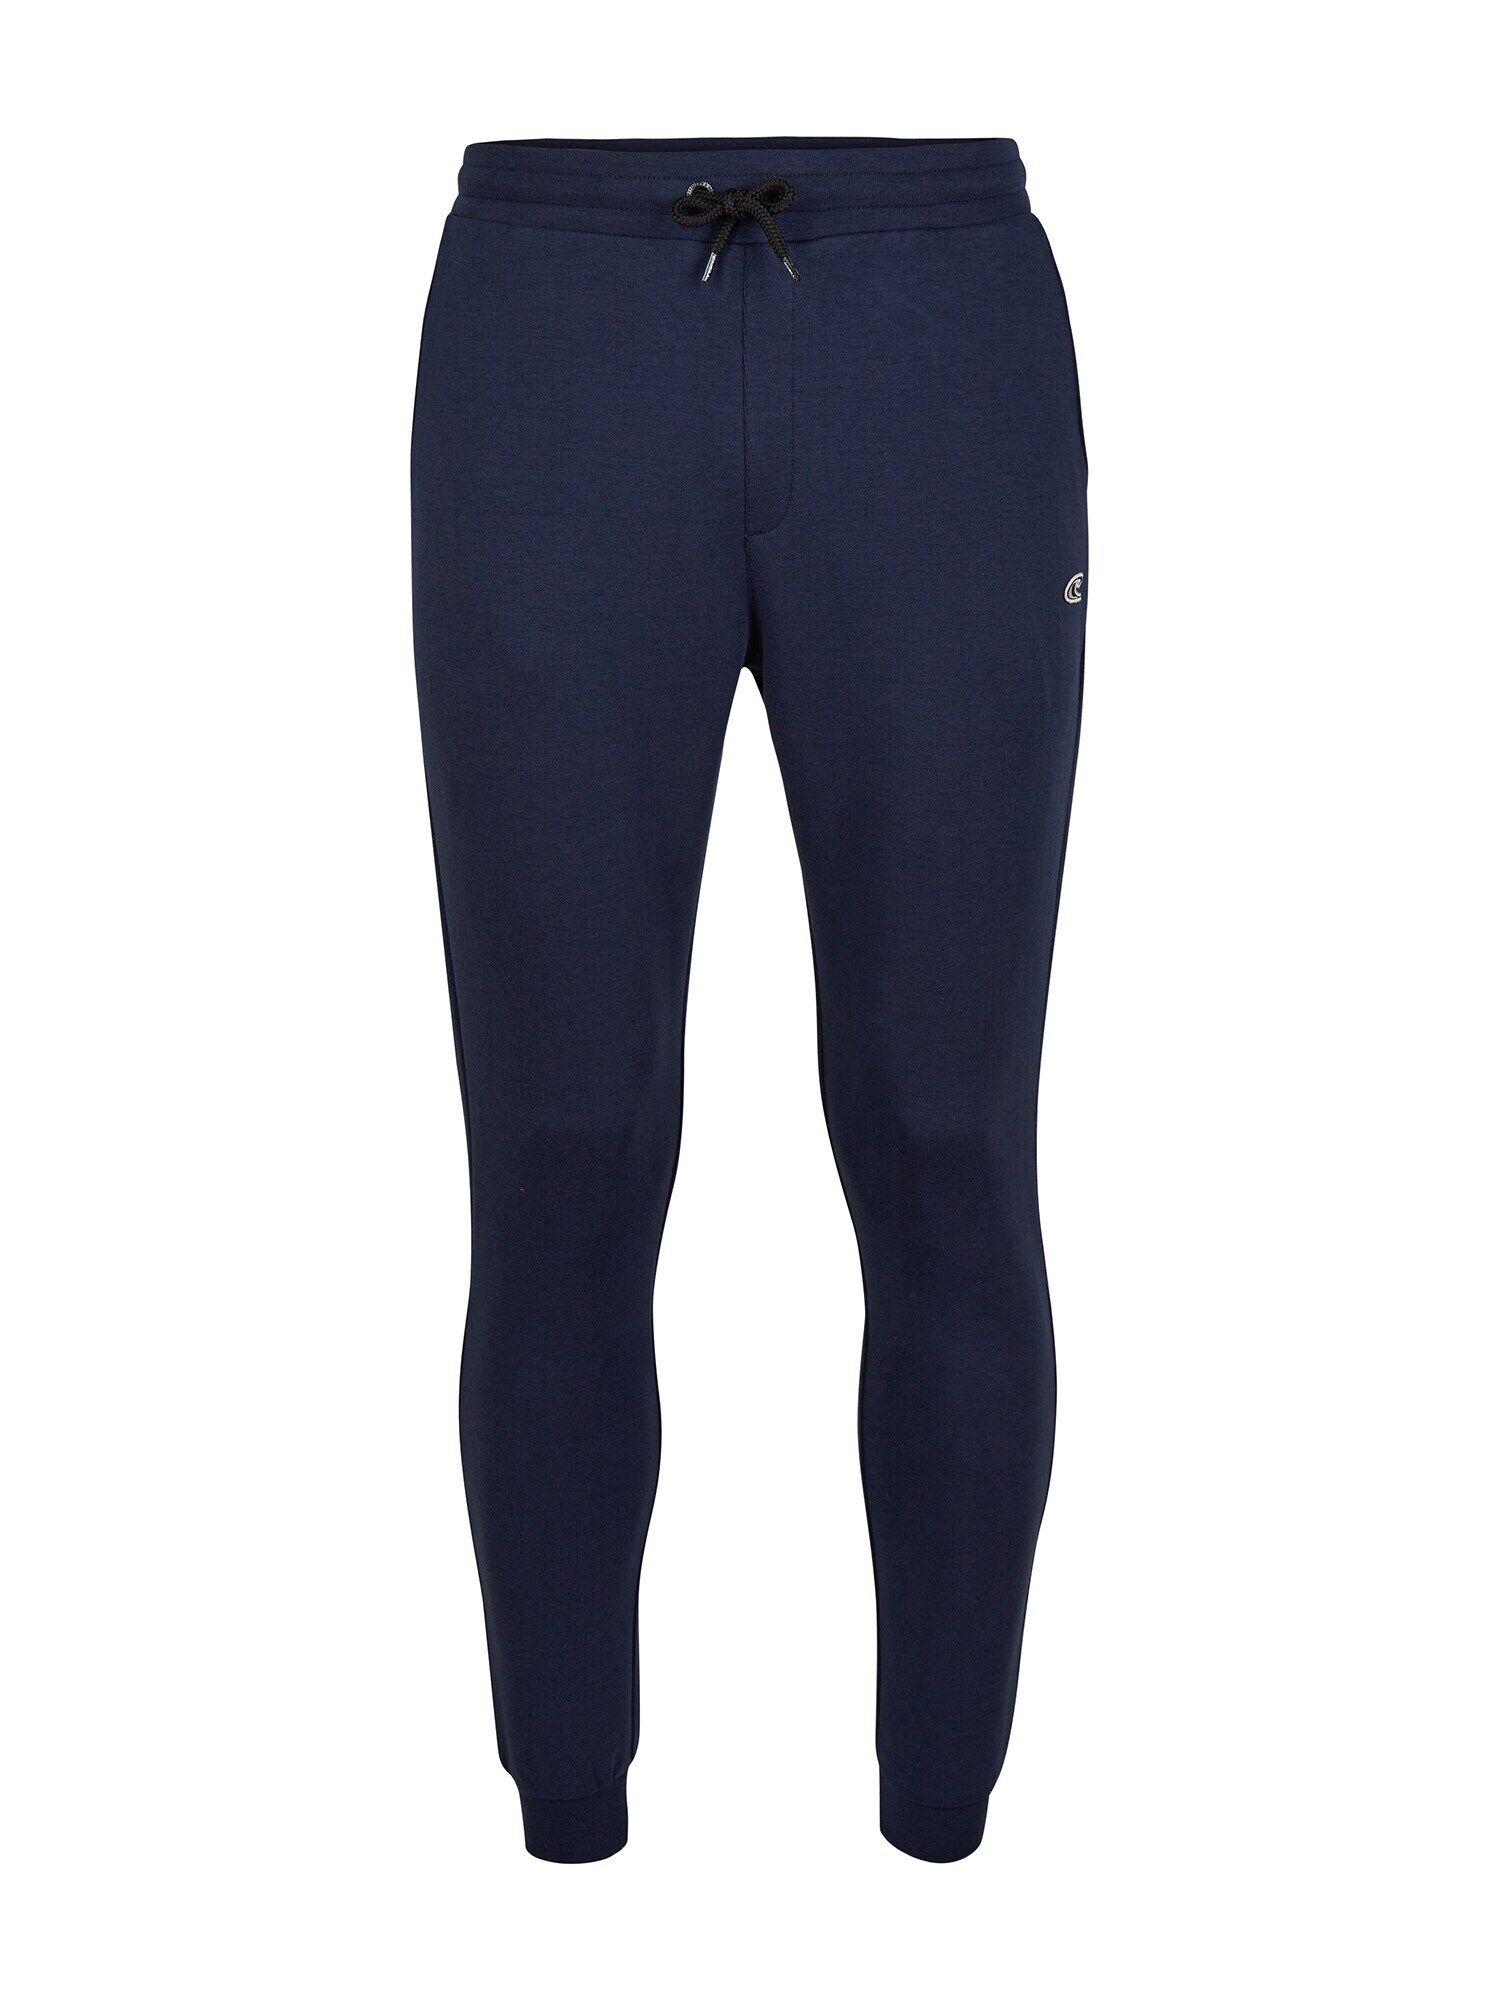 O'NEILL Pantalon 'Transit'  - Bleu - Taille: M - male